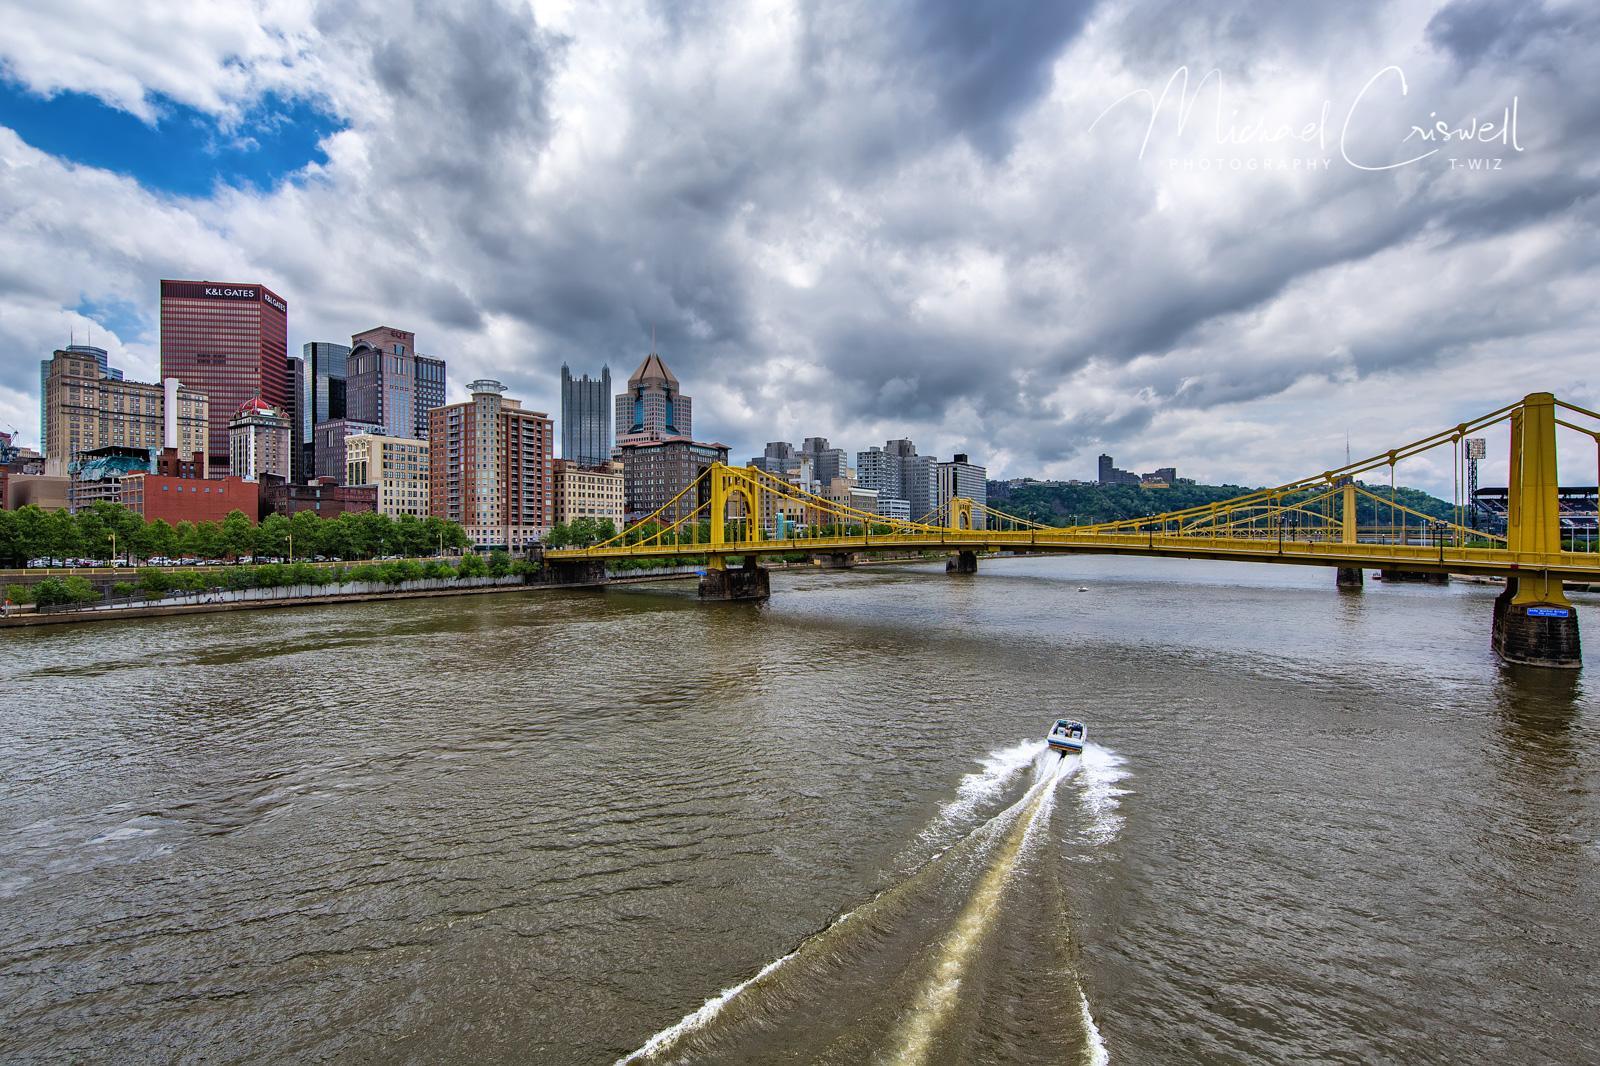 Cruising the Allegheny